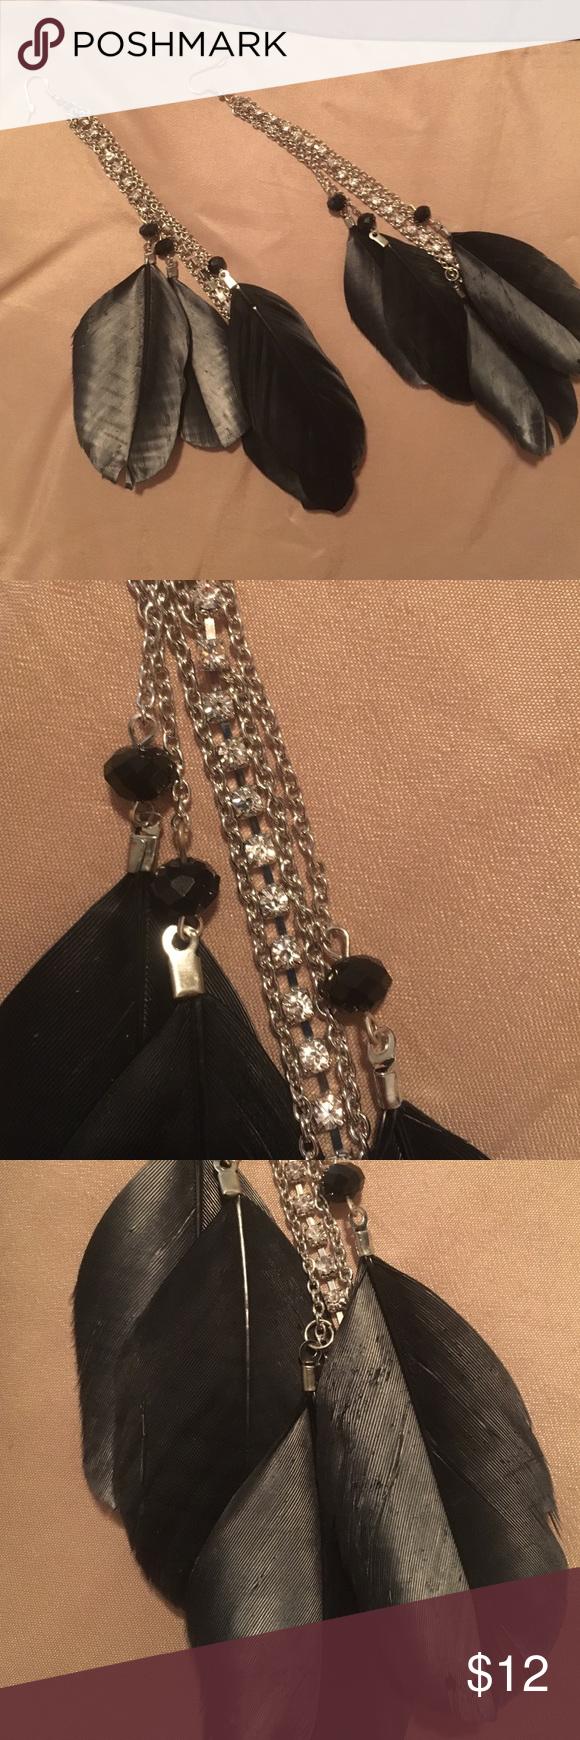 Rhinestone feather earrings! Never worn! Black feathers with rhinestone and beads! Jewelry Earrings